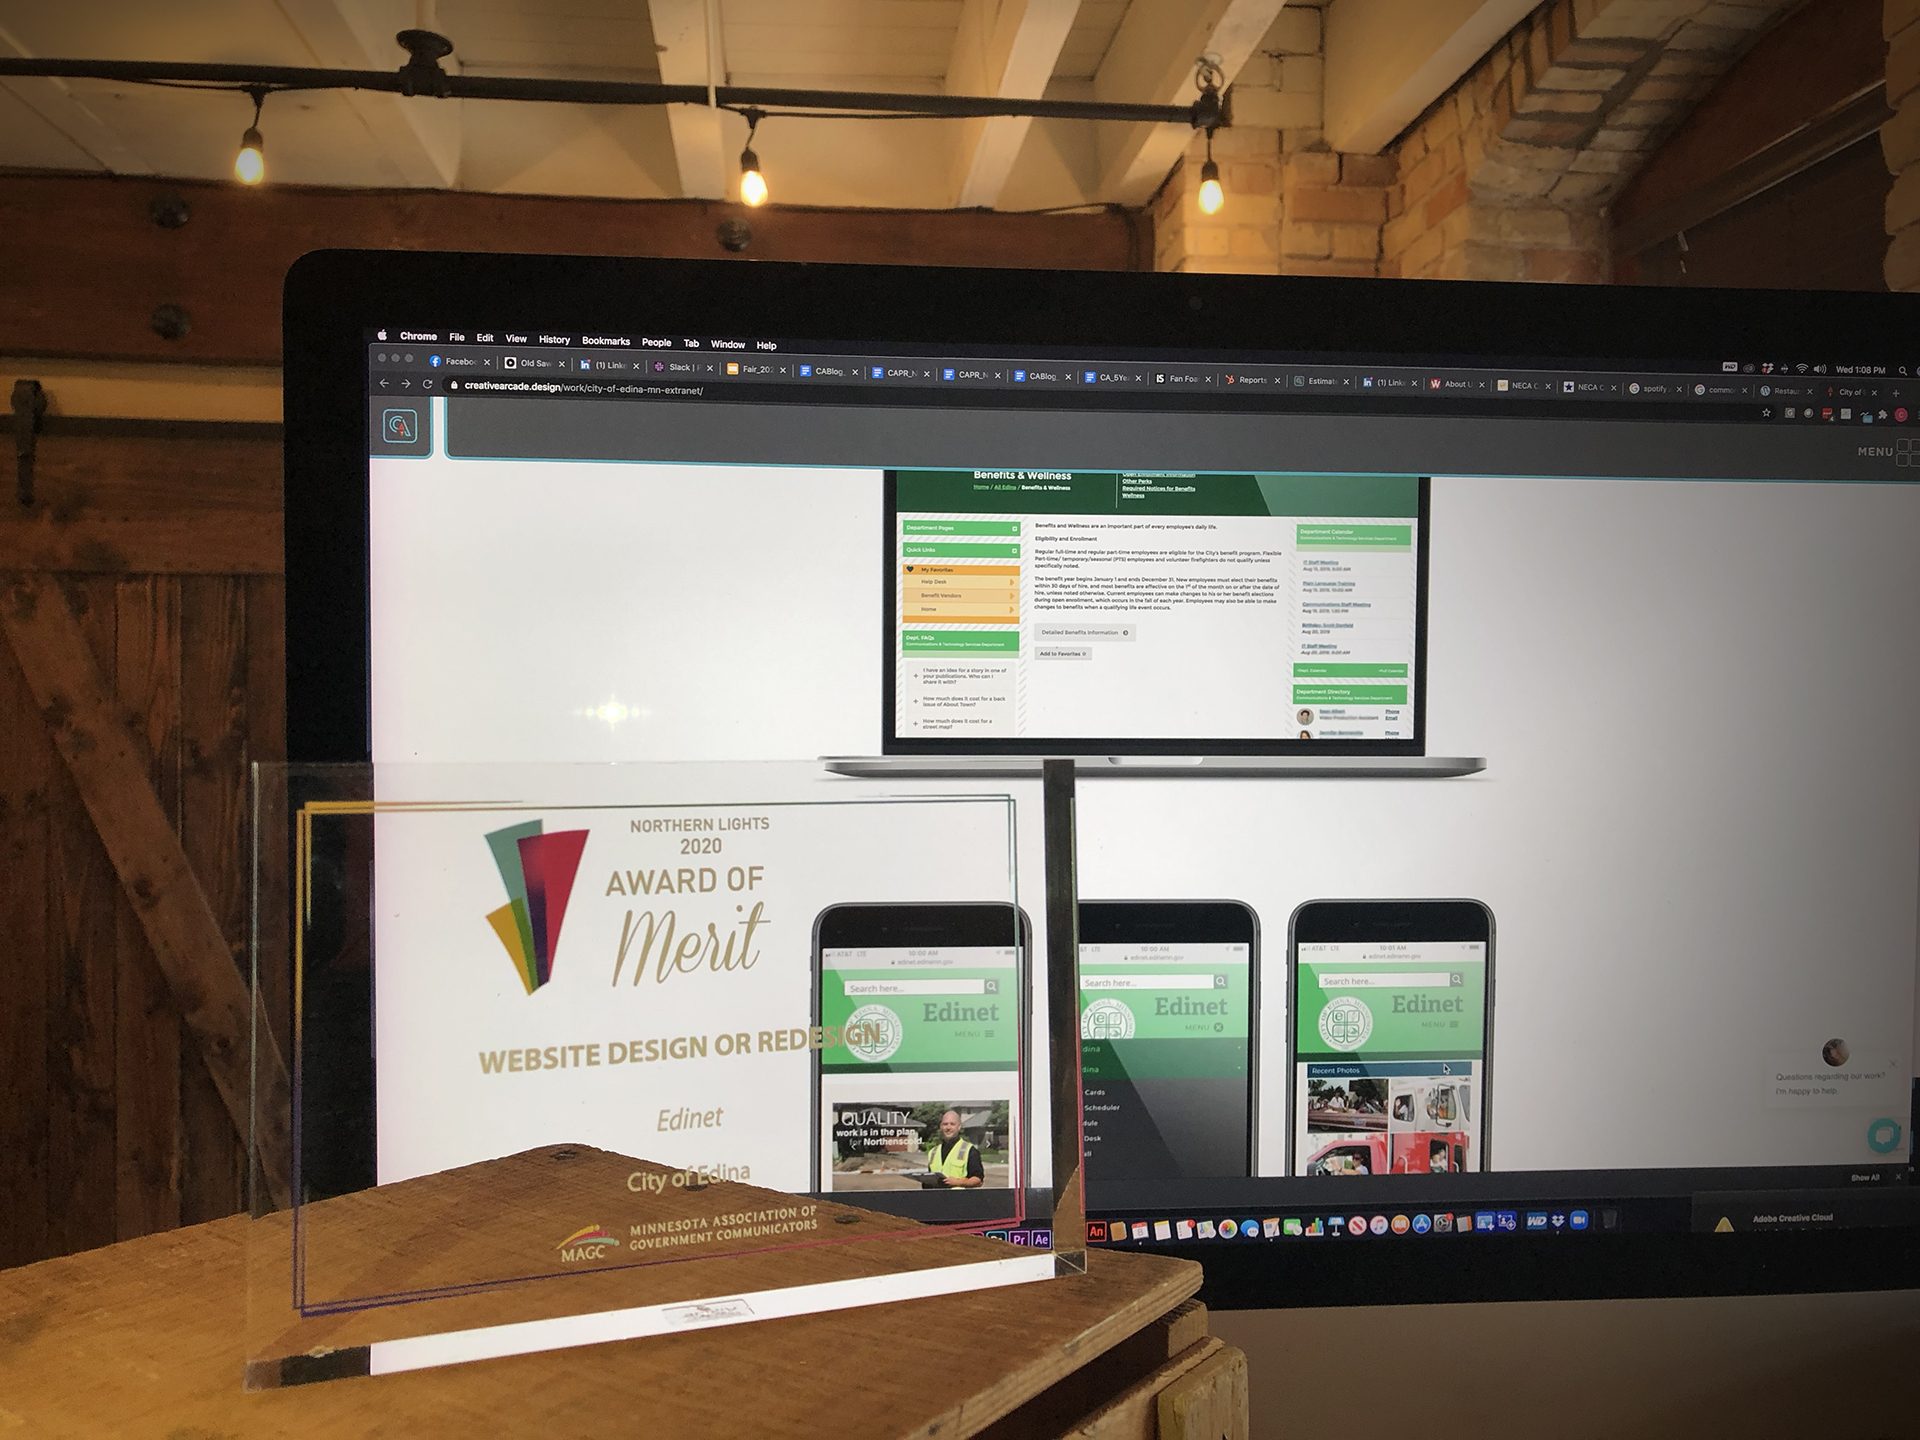 Creative Arcade Website Wins Northern Lights Award Featured Image